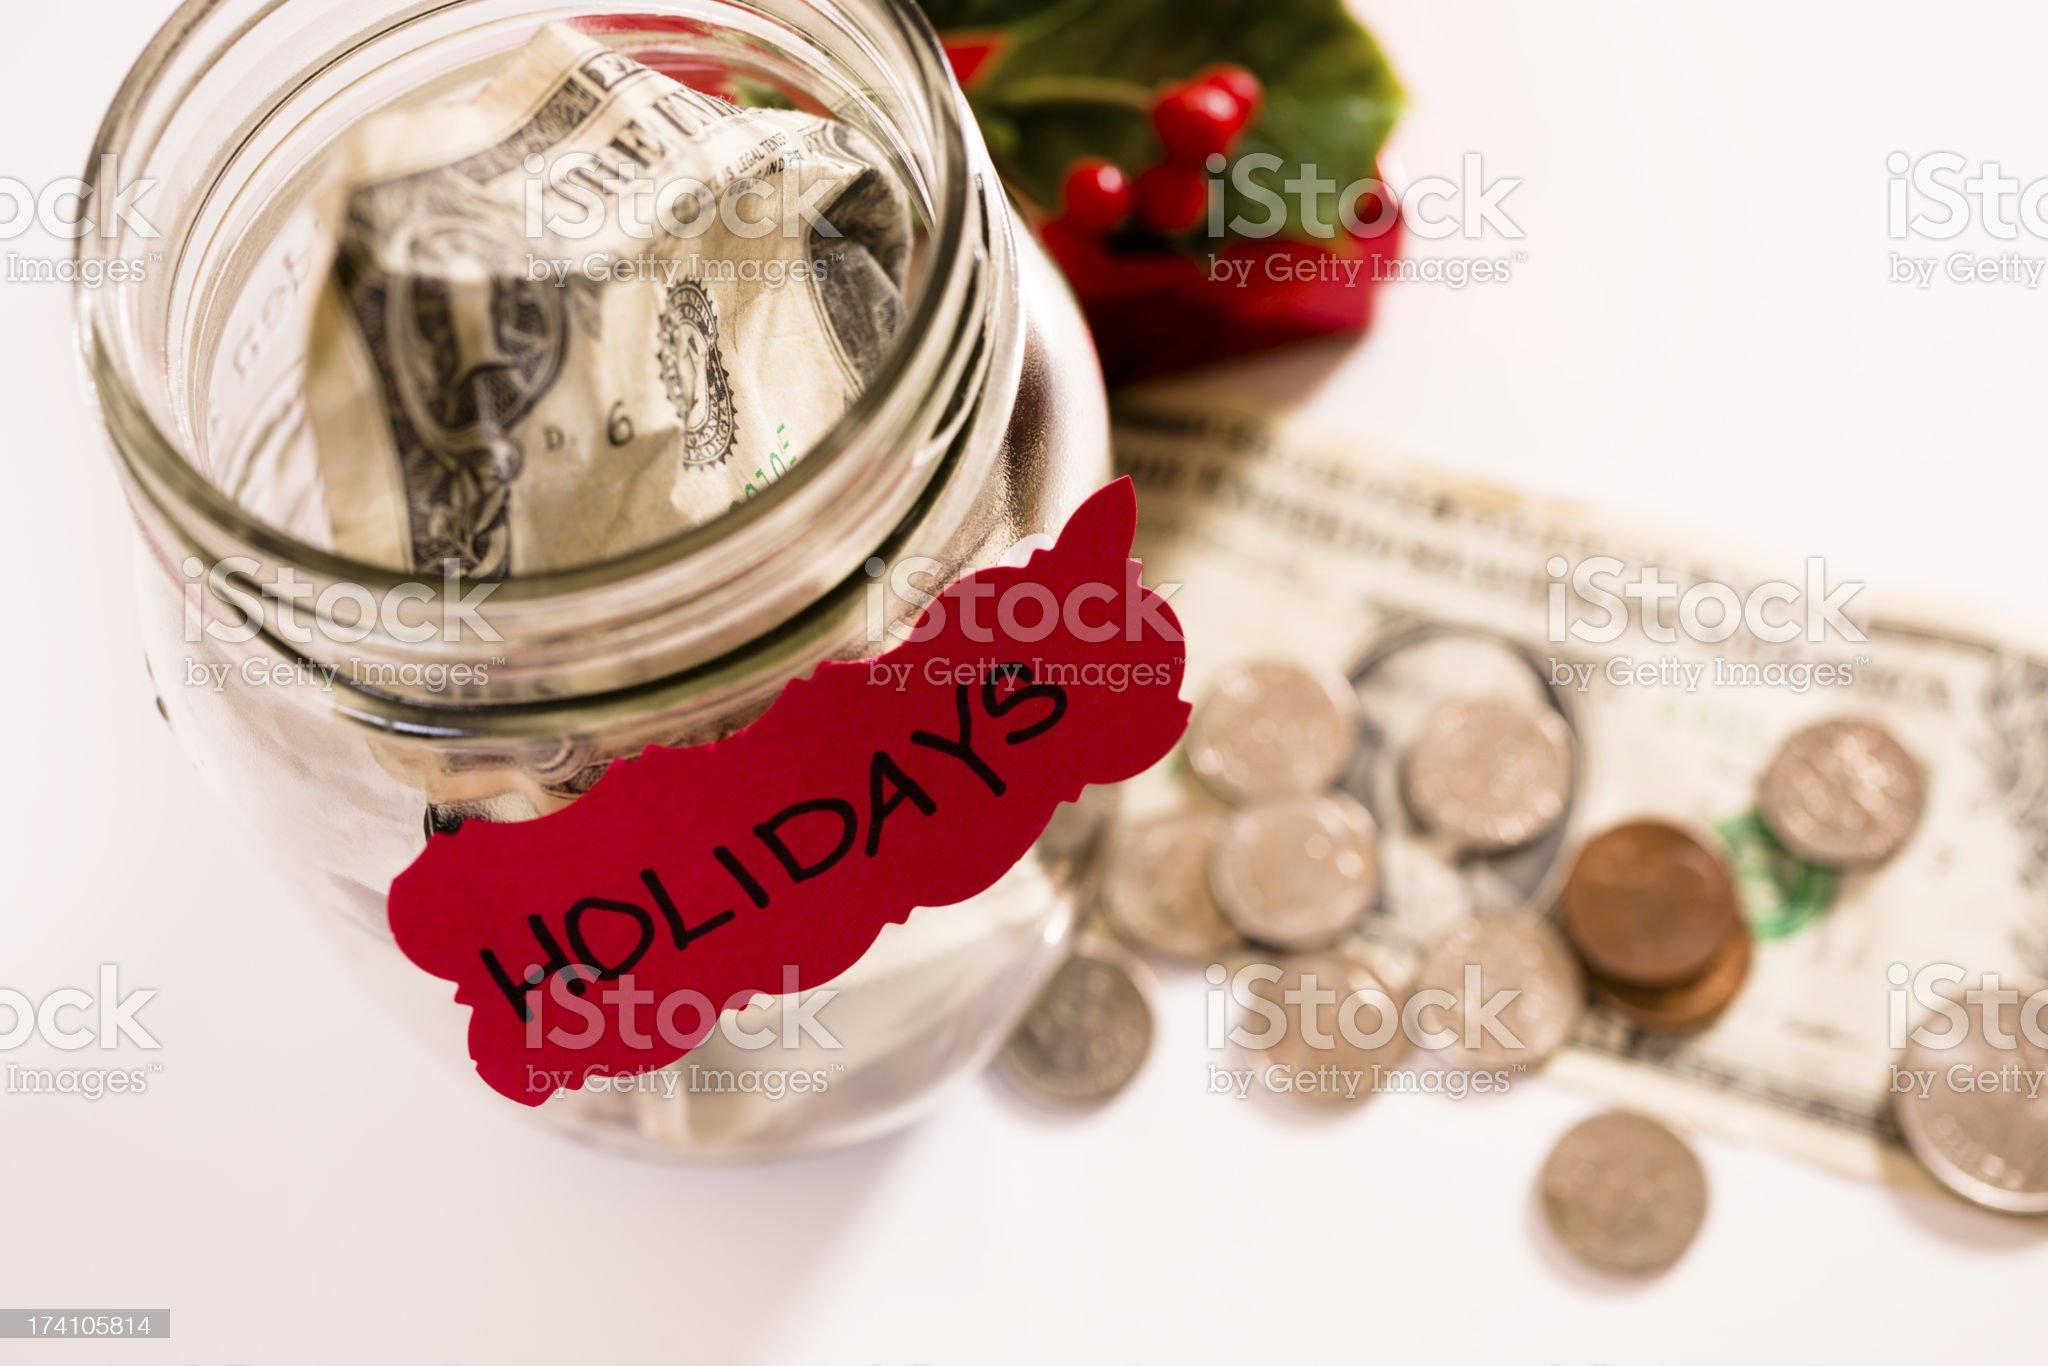 Christmas:  Money Jar with coins, dollar bills.  Saving for Holidays. royalty-free stock photo